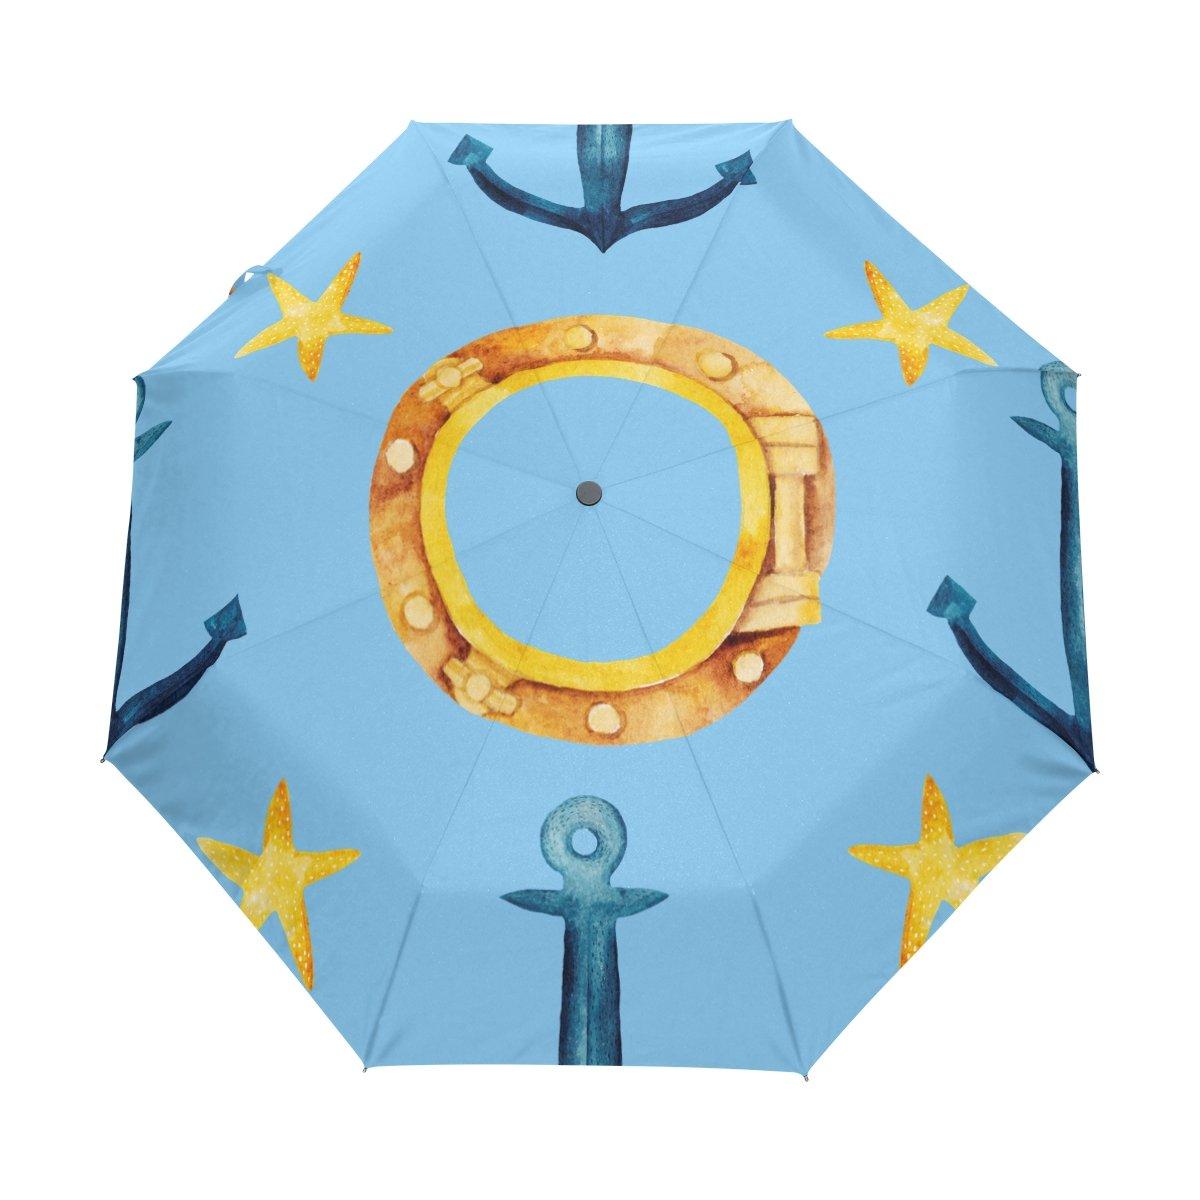 Senya Saobao防風と防雨トラベル傘with自動開いて閉じFoldingナビゲーションアイコンポータブル折りたたみ式太陽雨傘 B07FDPTZXN